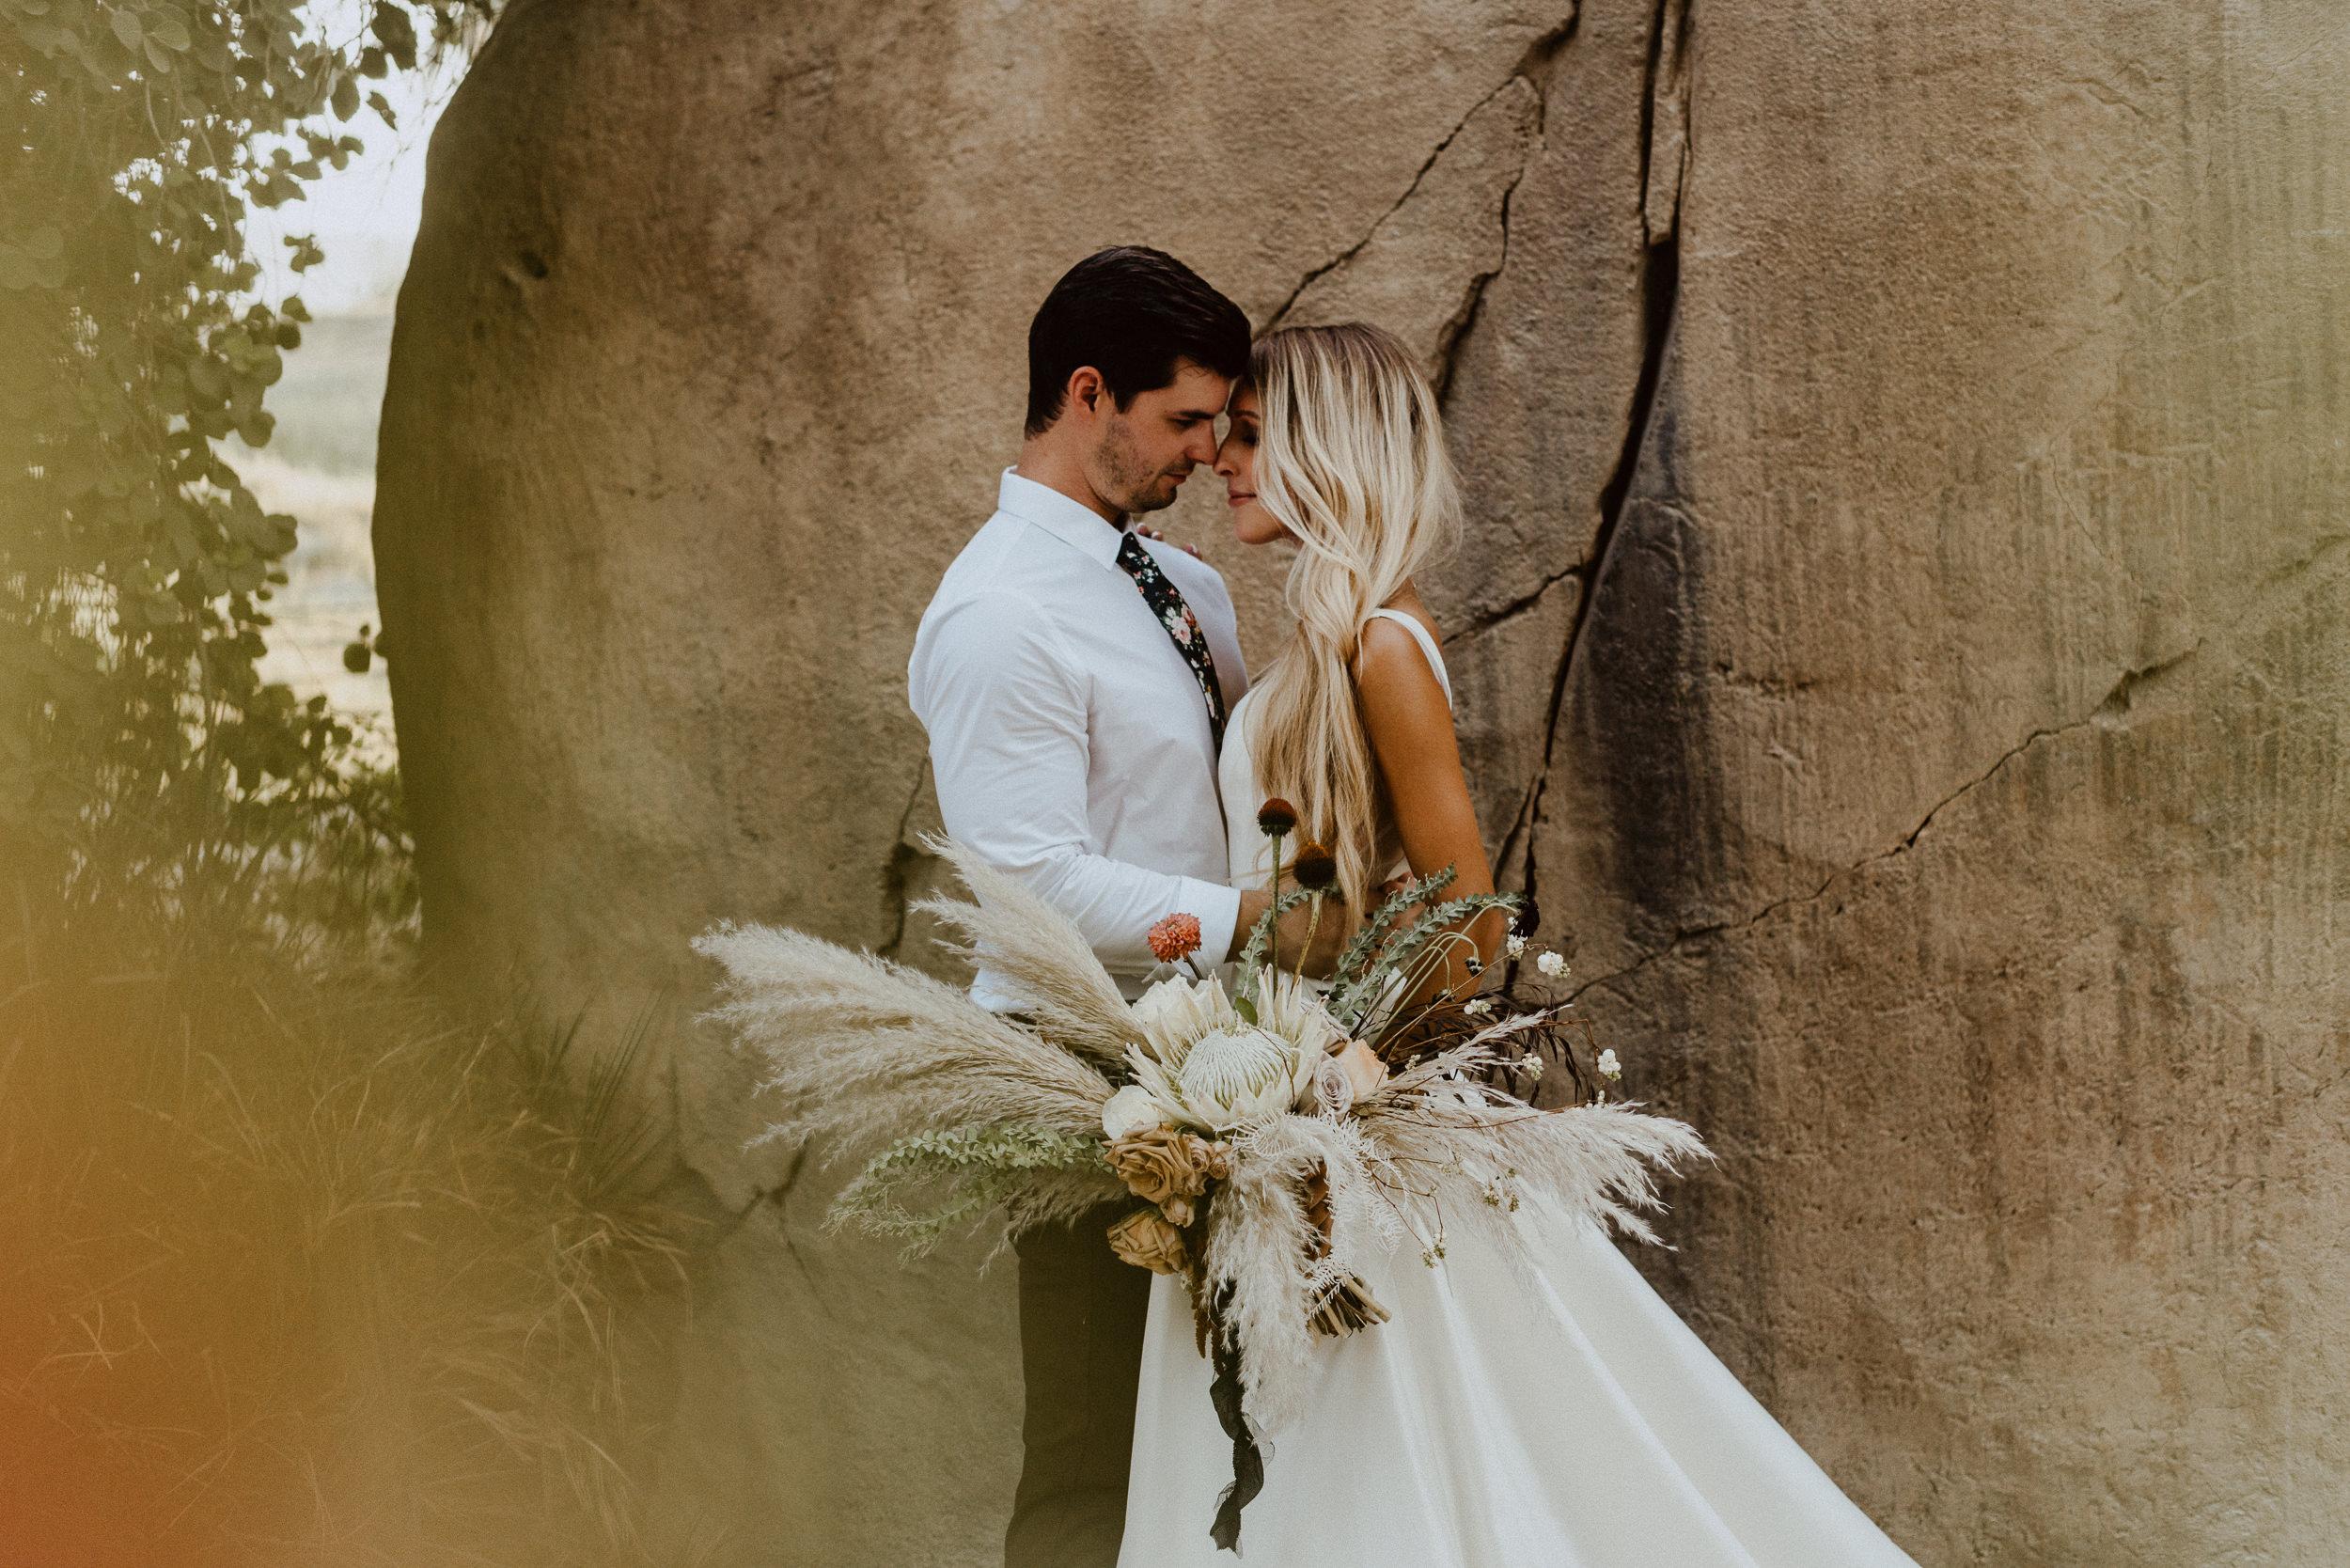 sChelsie + Chris - The Desert Shootout Wedding Romantics at The Living Desert-117.jpg